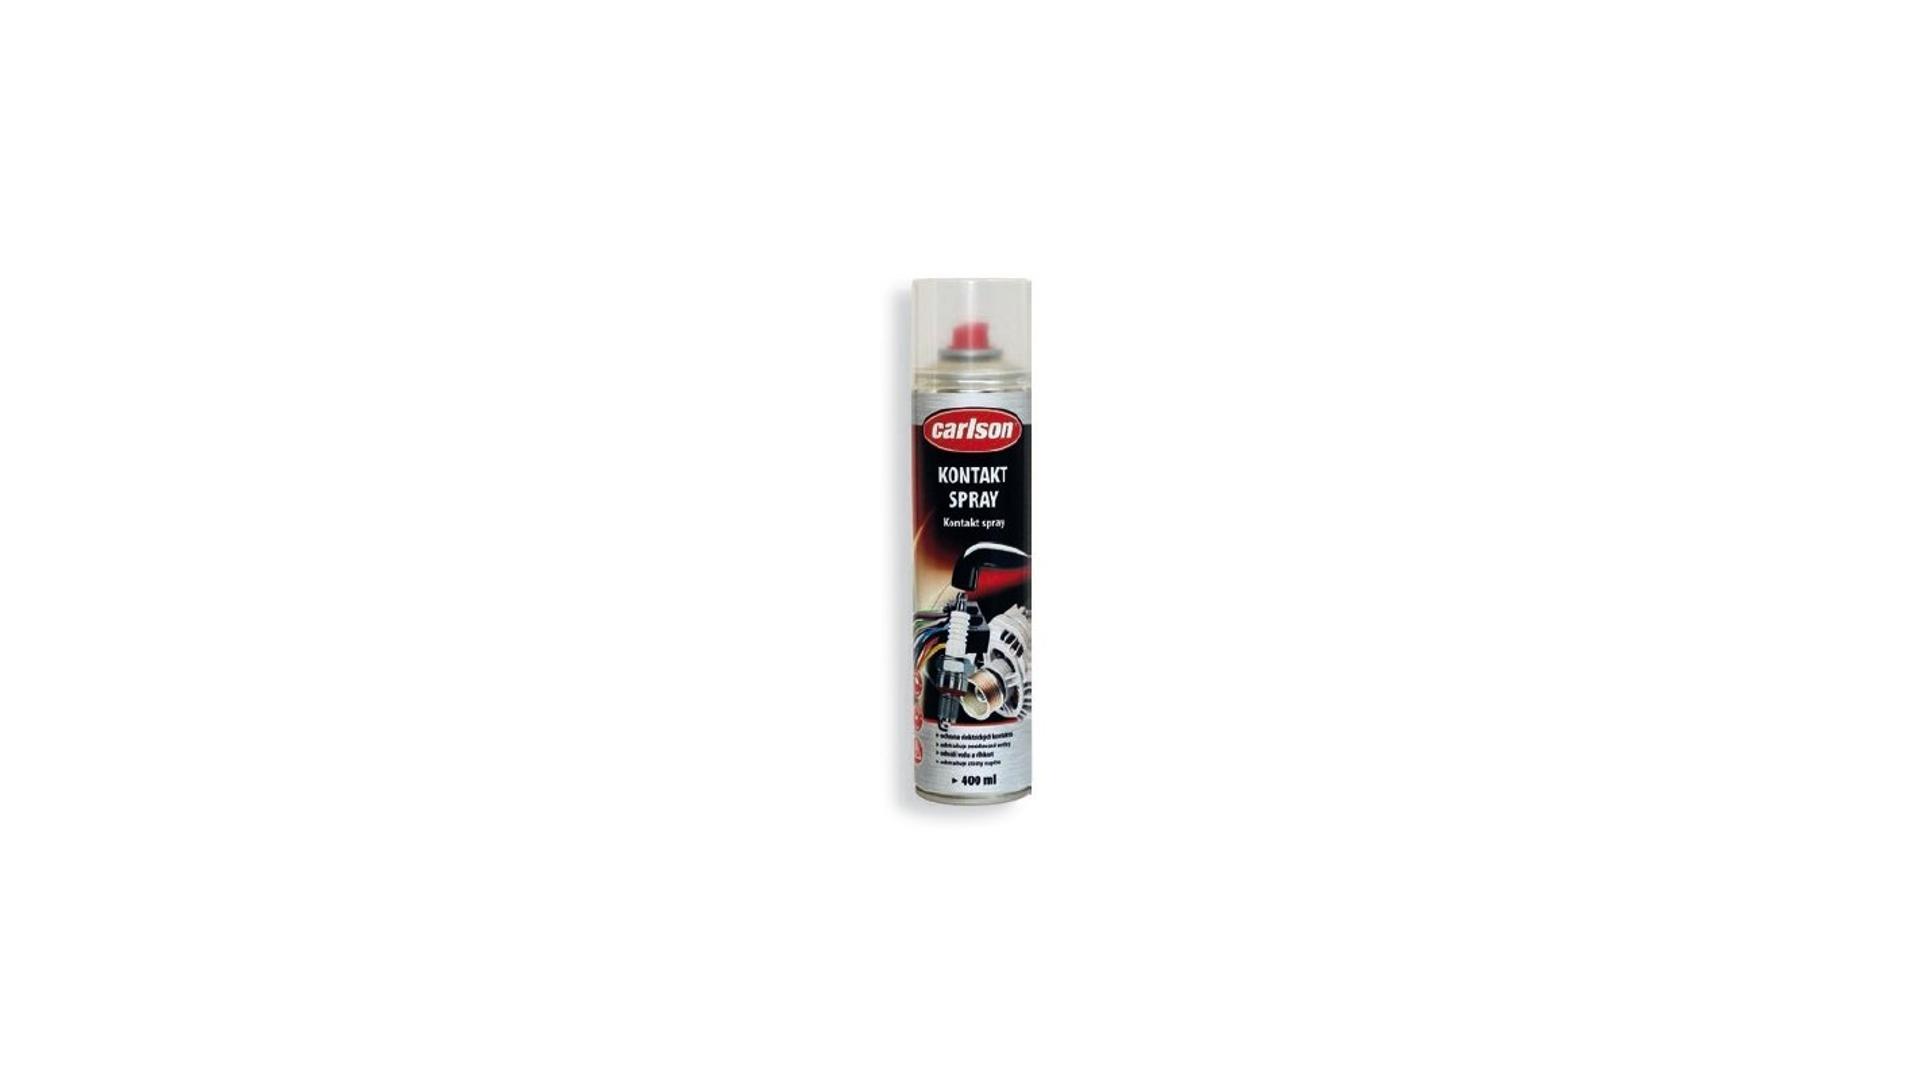 CARLSON kontakt spray 400ml - aerosol